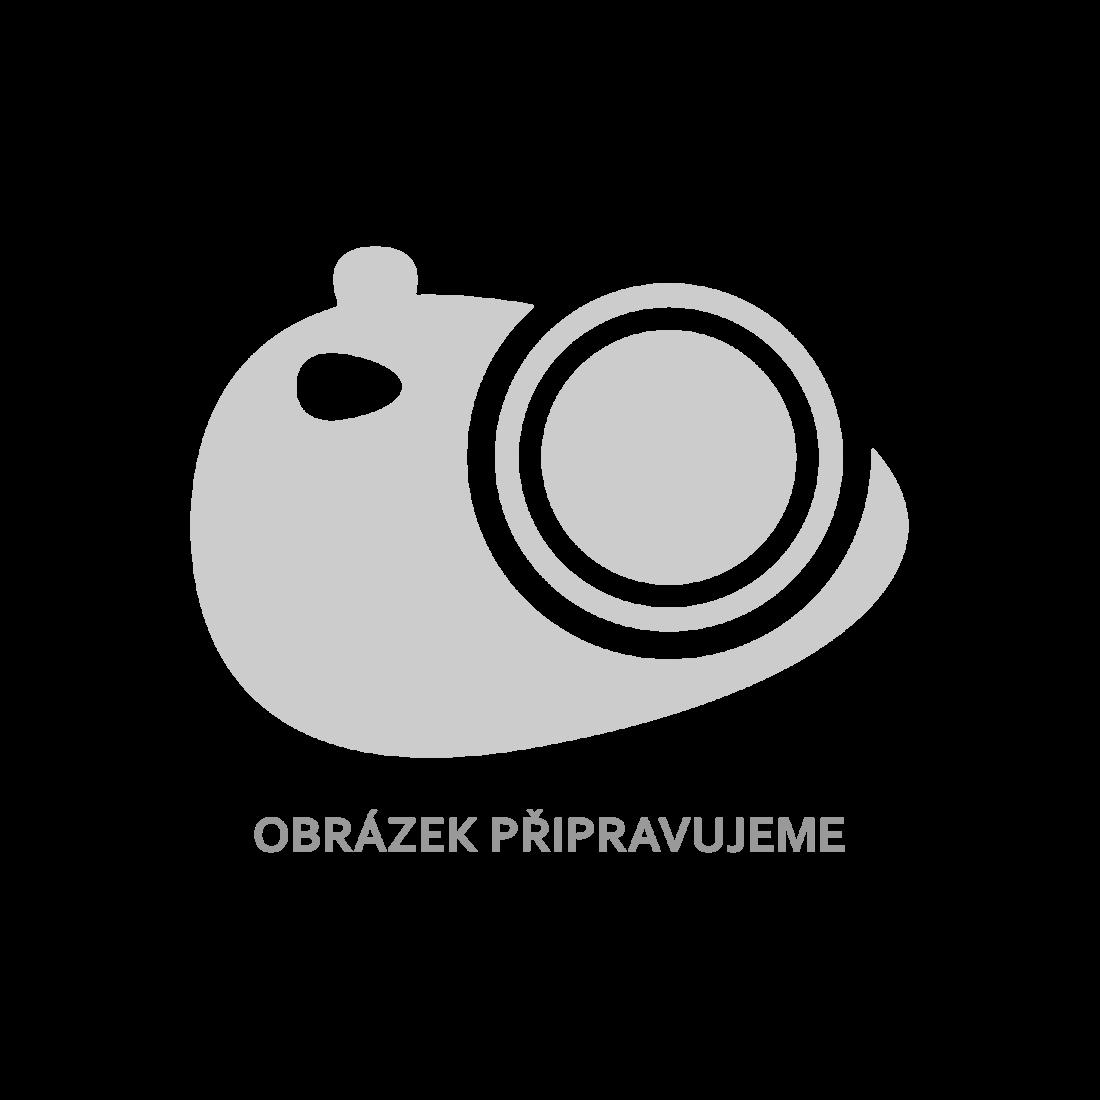 Roleta Zebra / noc a den / Twinroll 90 x 150 cm, černá